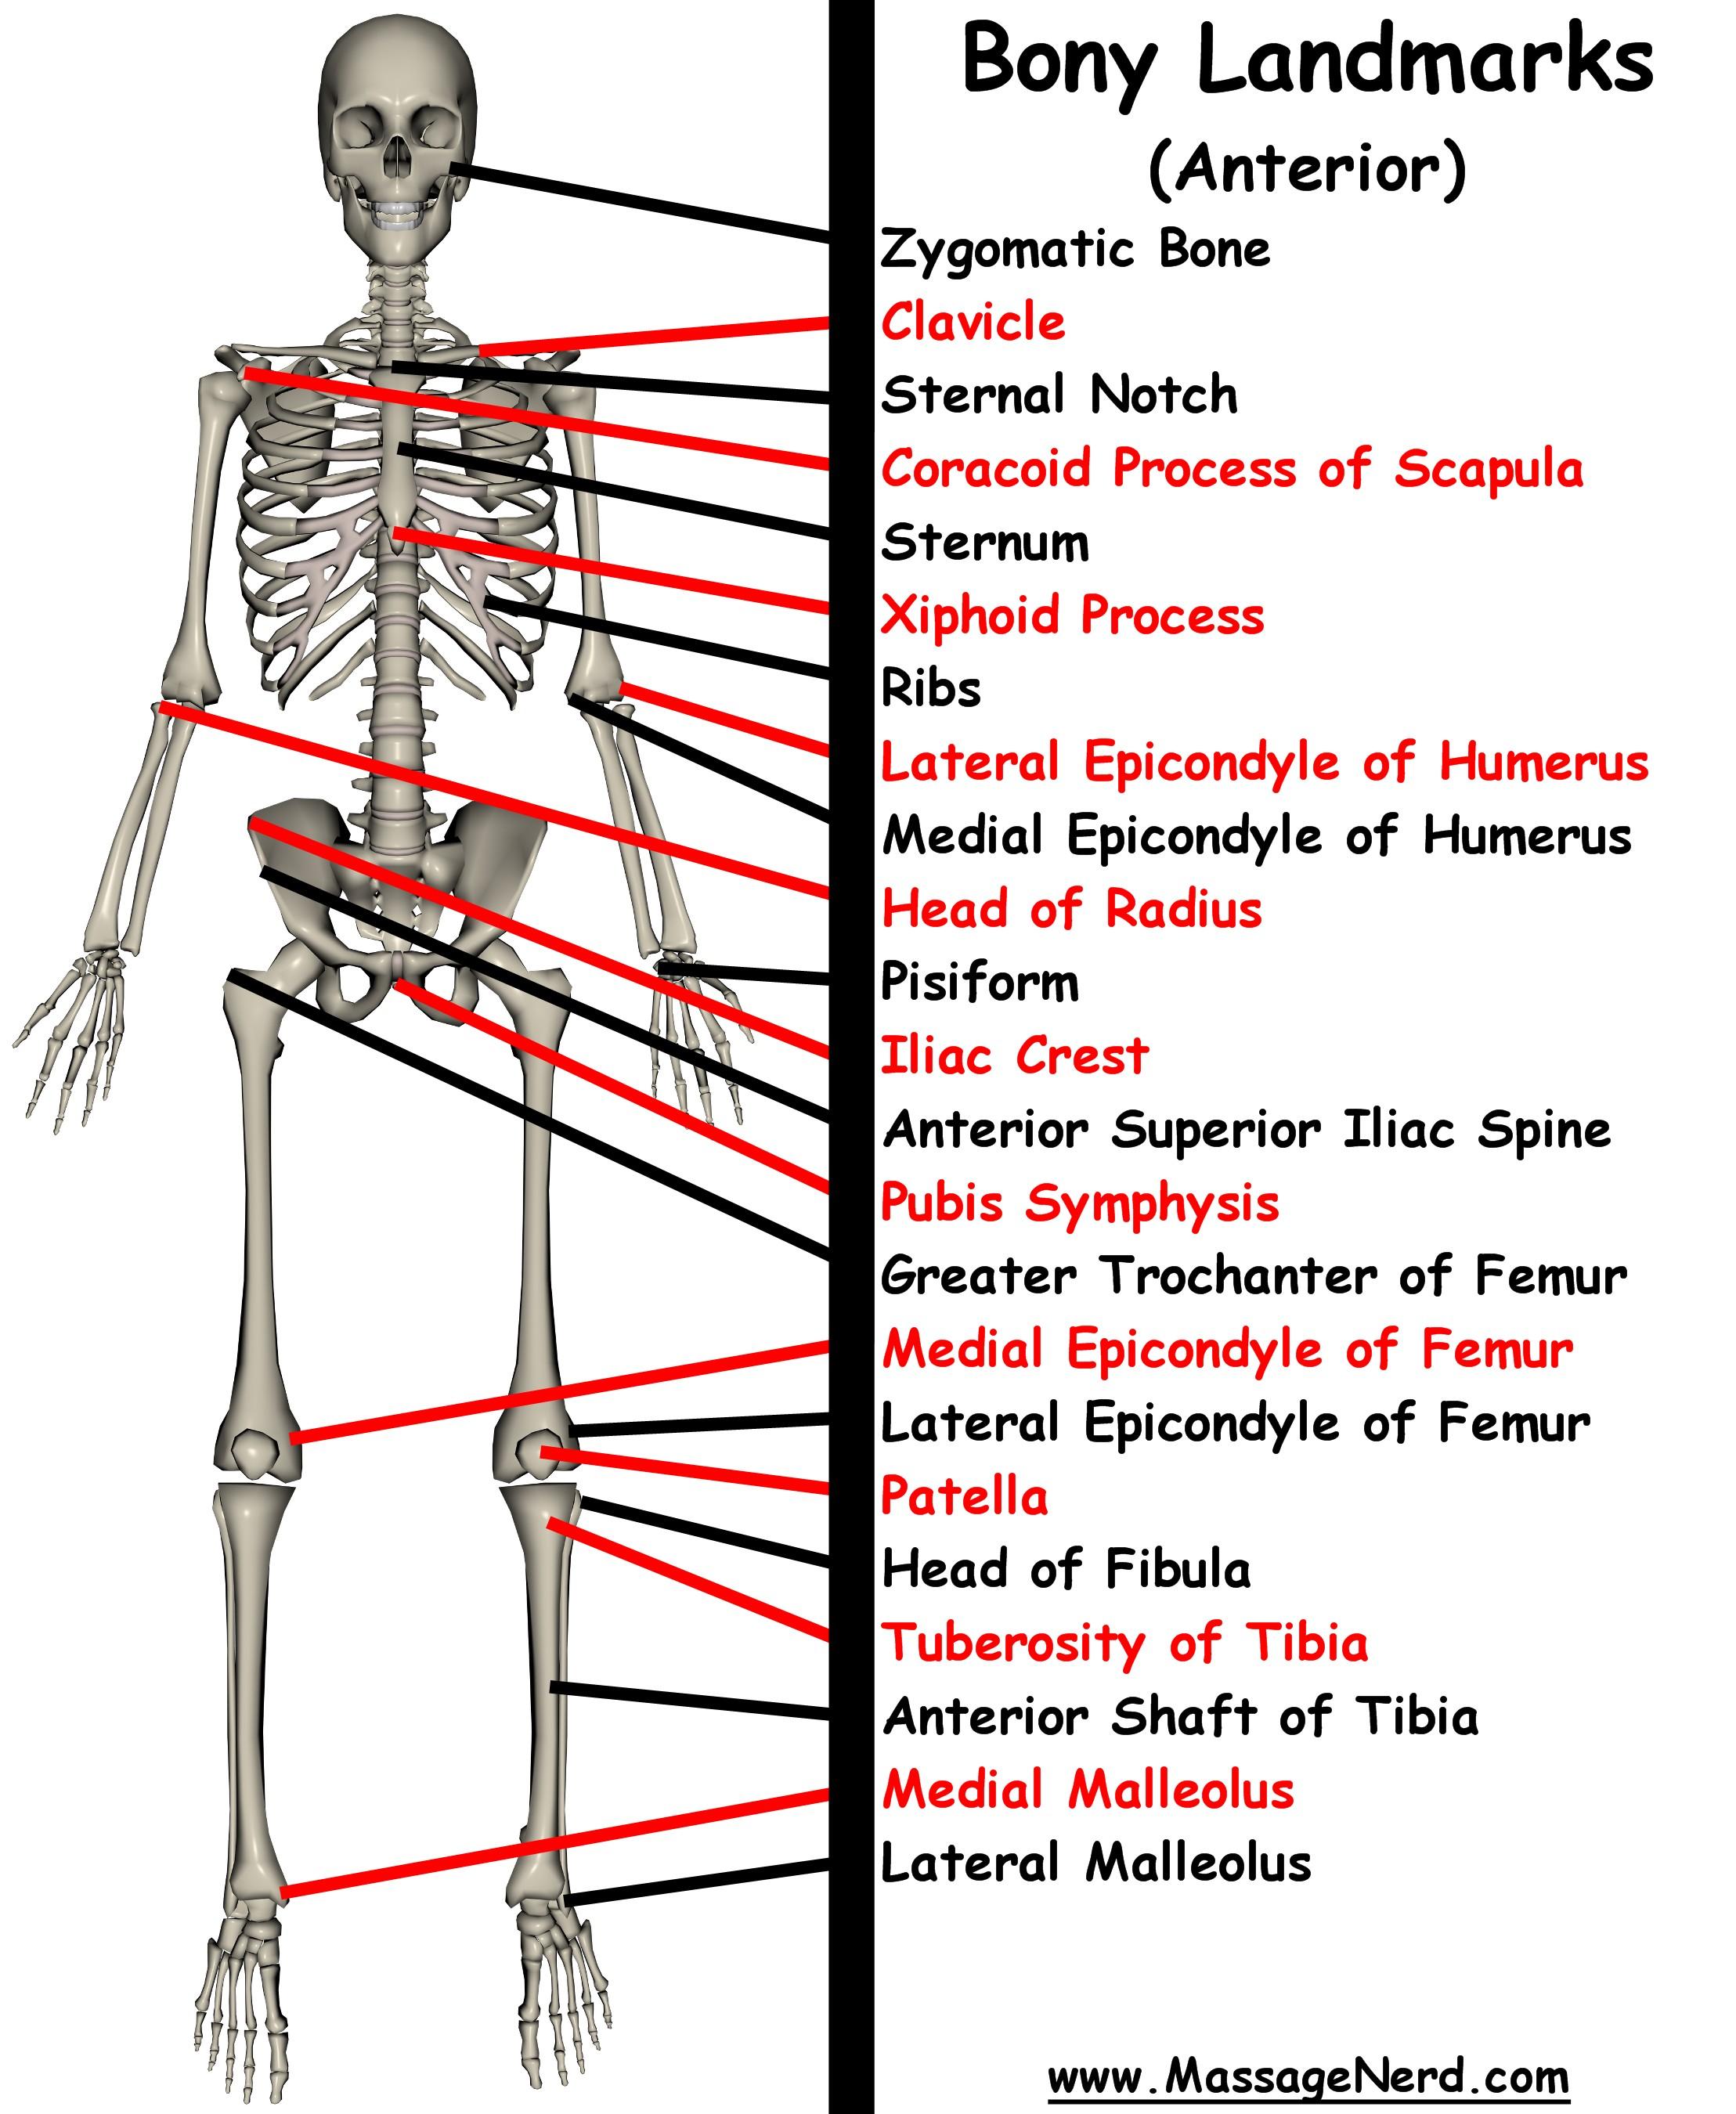 Surface anatomy landmarks human body 5594181 - follow4more.info